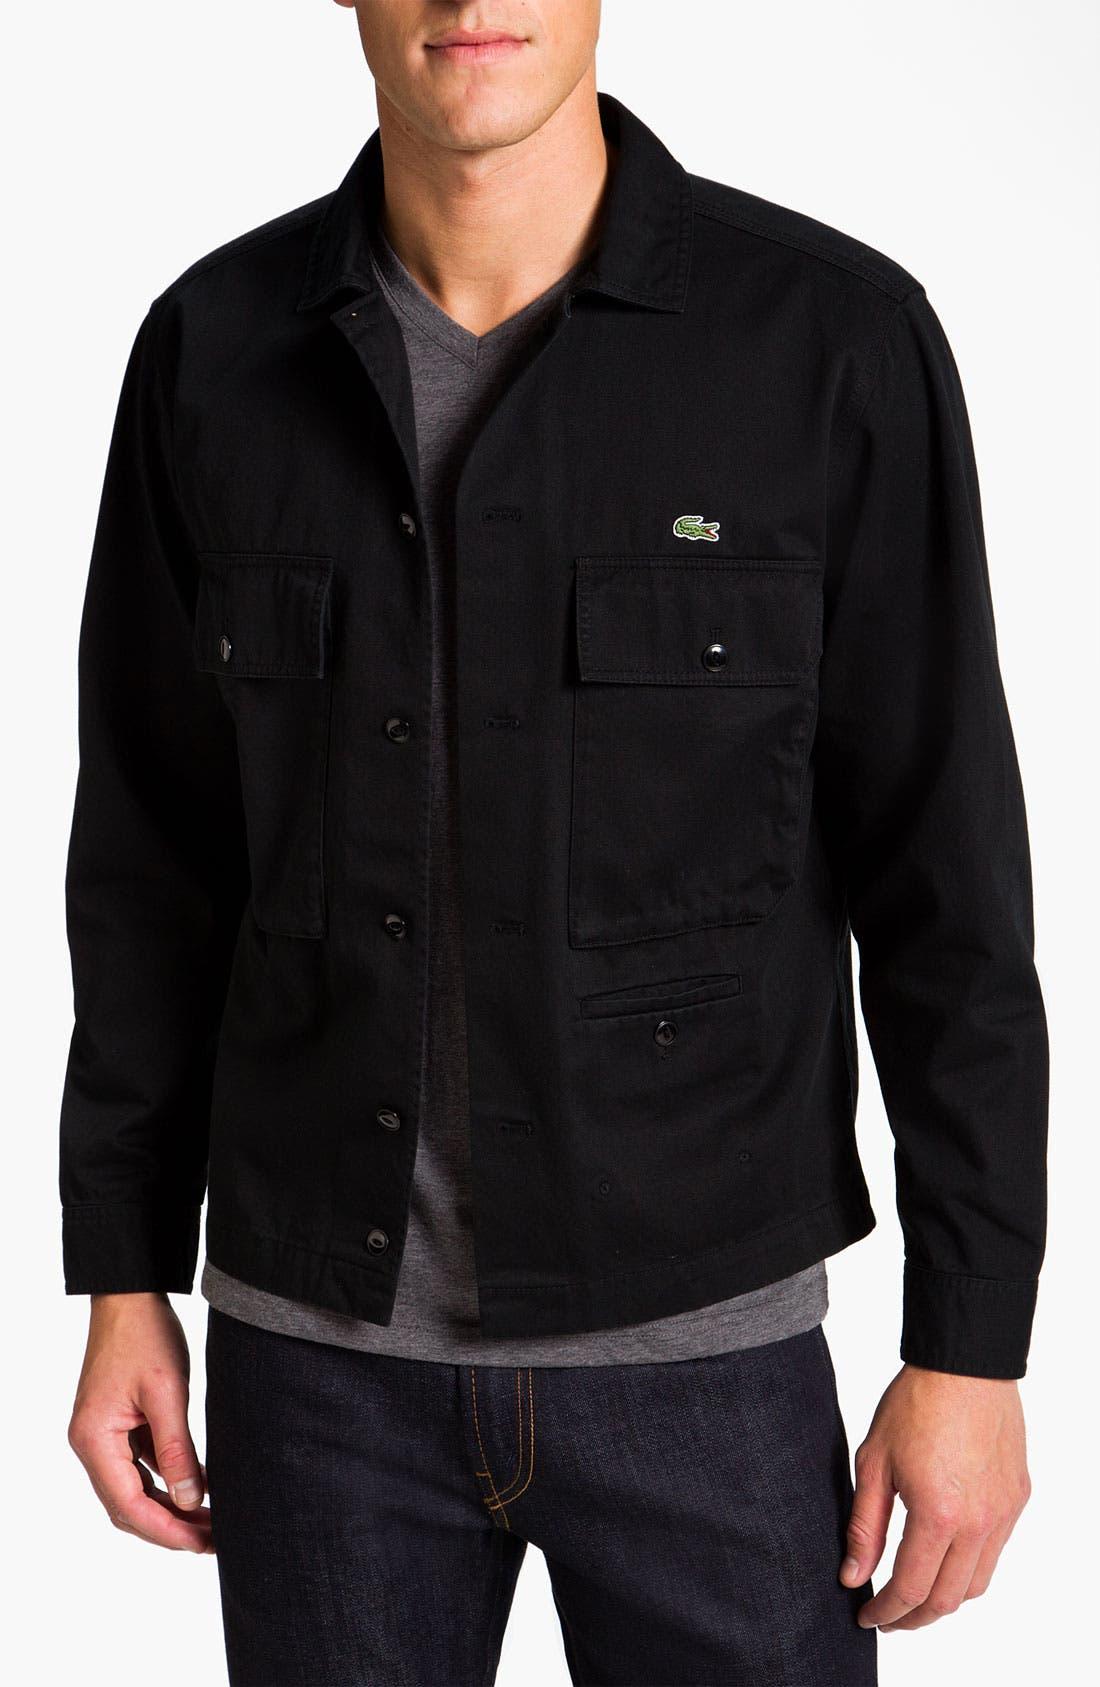 Alternate Image 1 Selected - Lacoste L!VE Cotton Twill Trim Fit Shirt Jacket